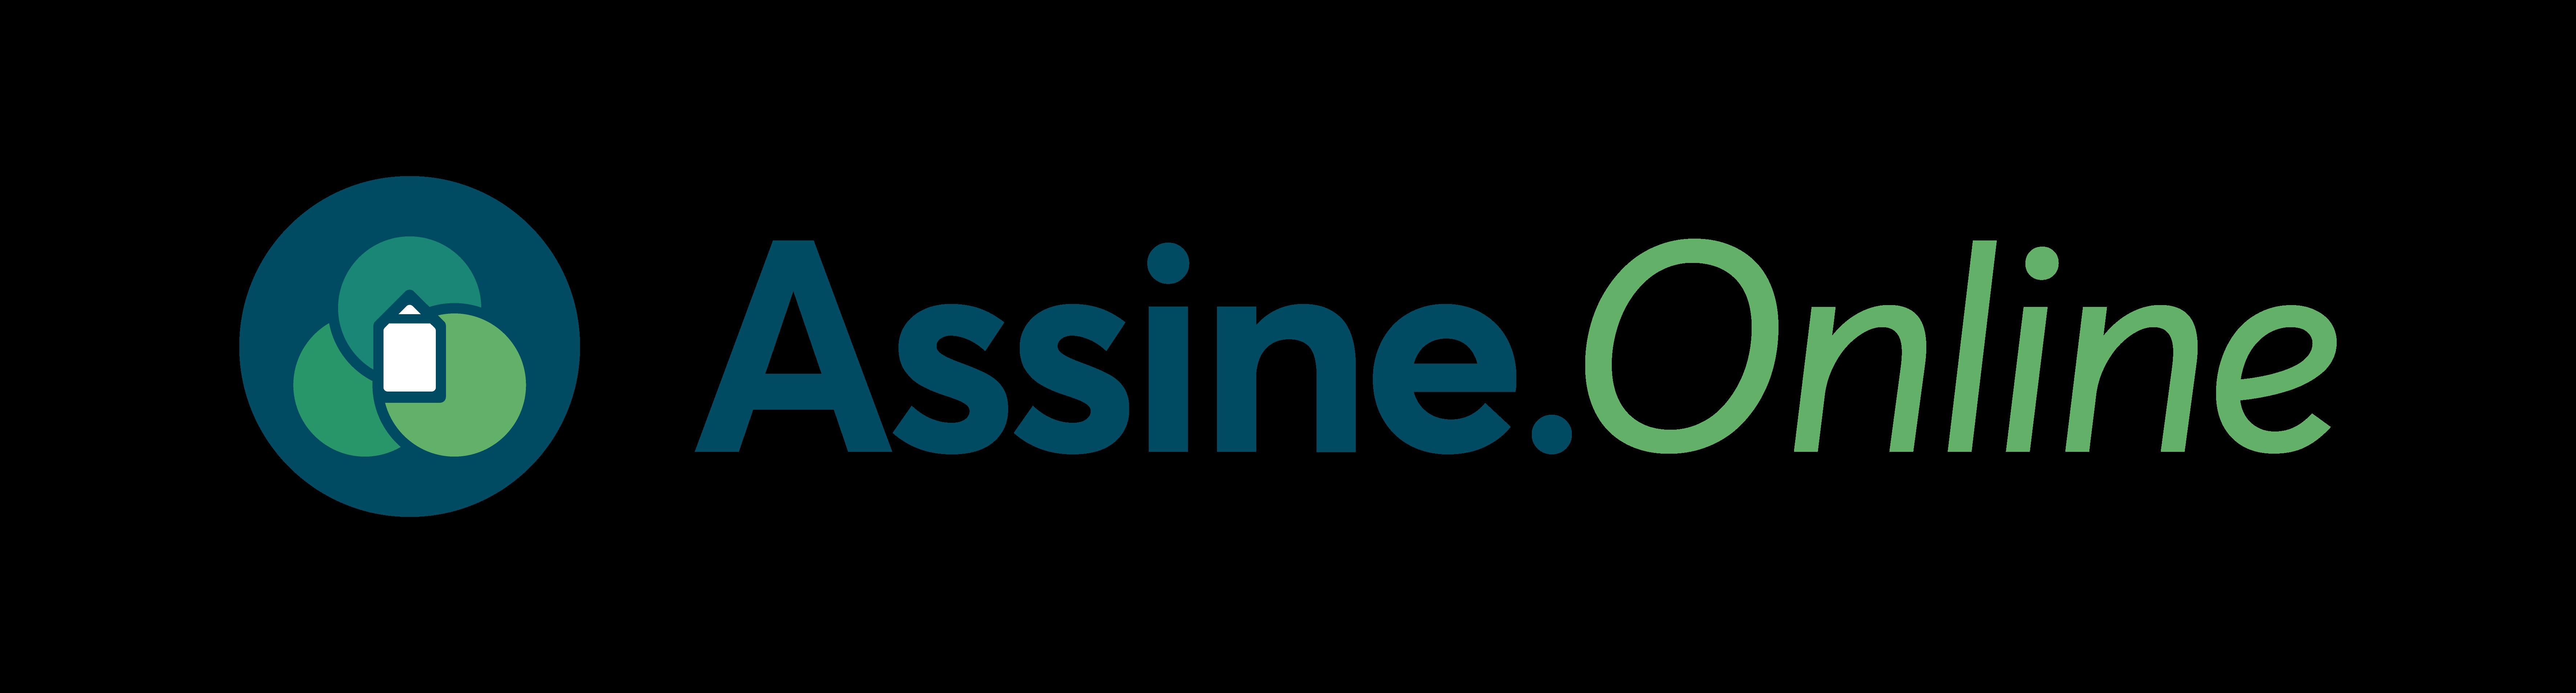 Assine.Online